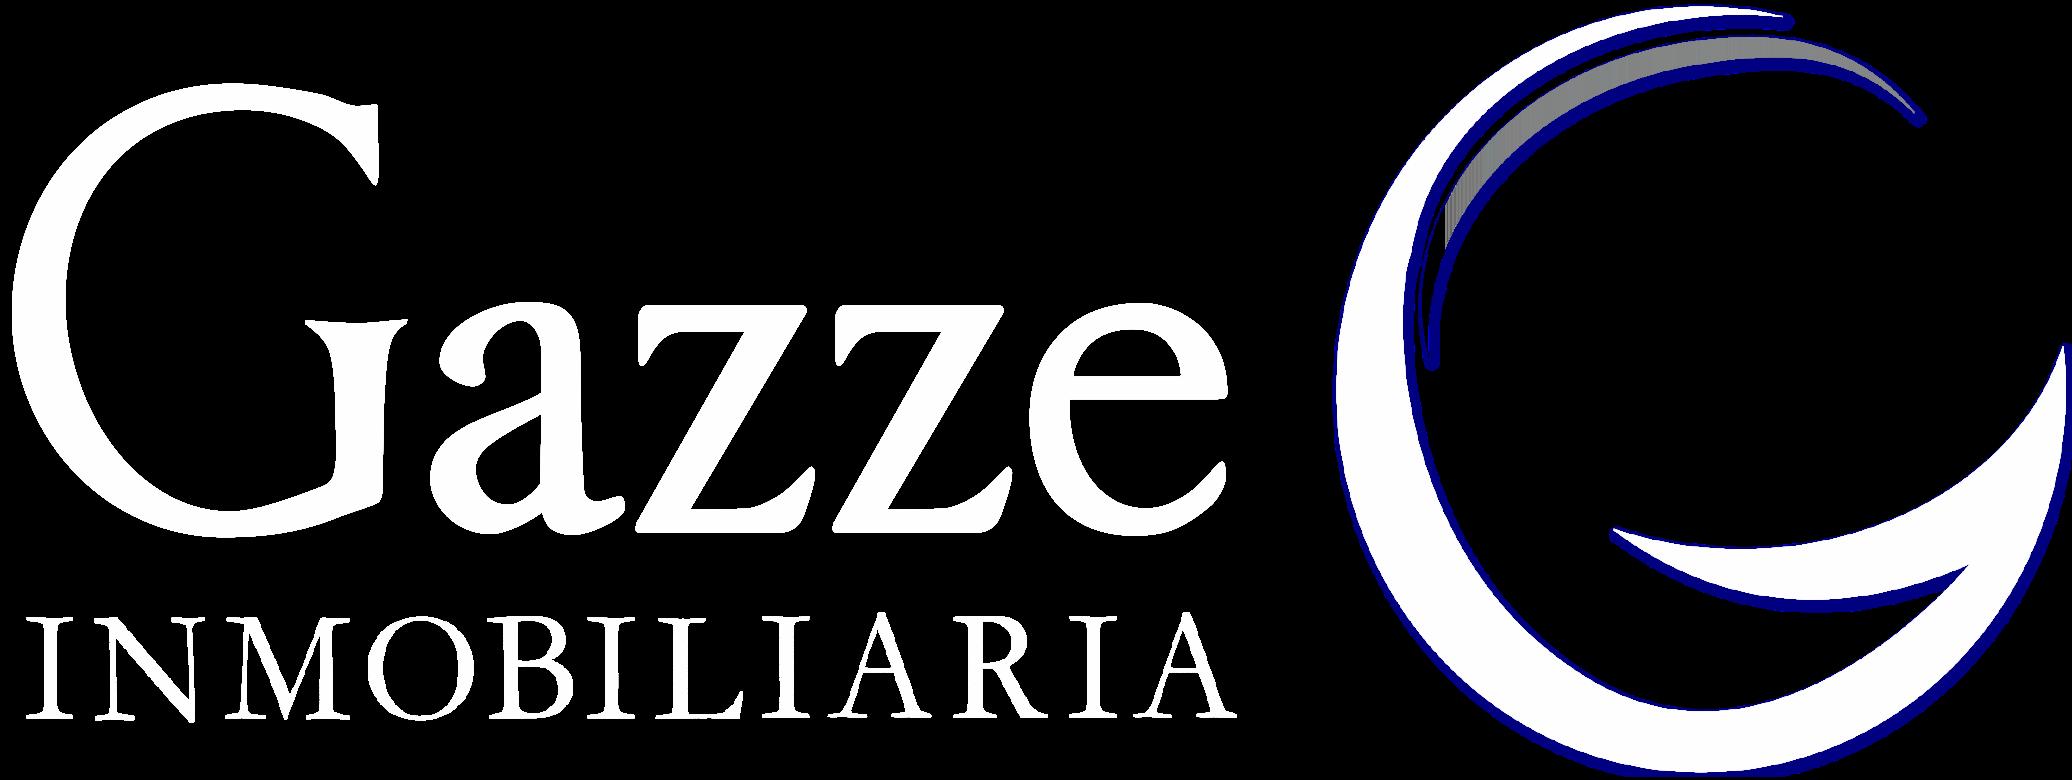 Gazze_2020_EB_2.png